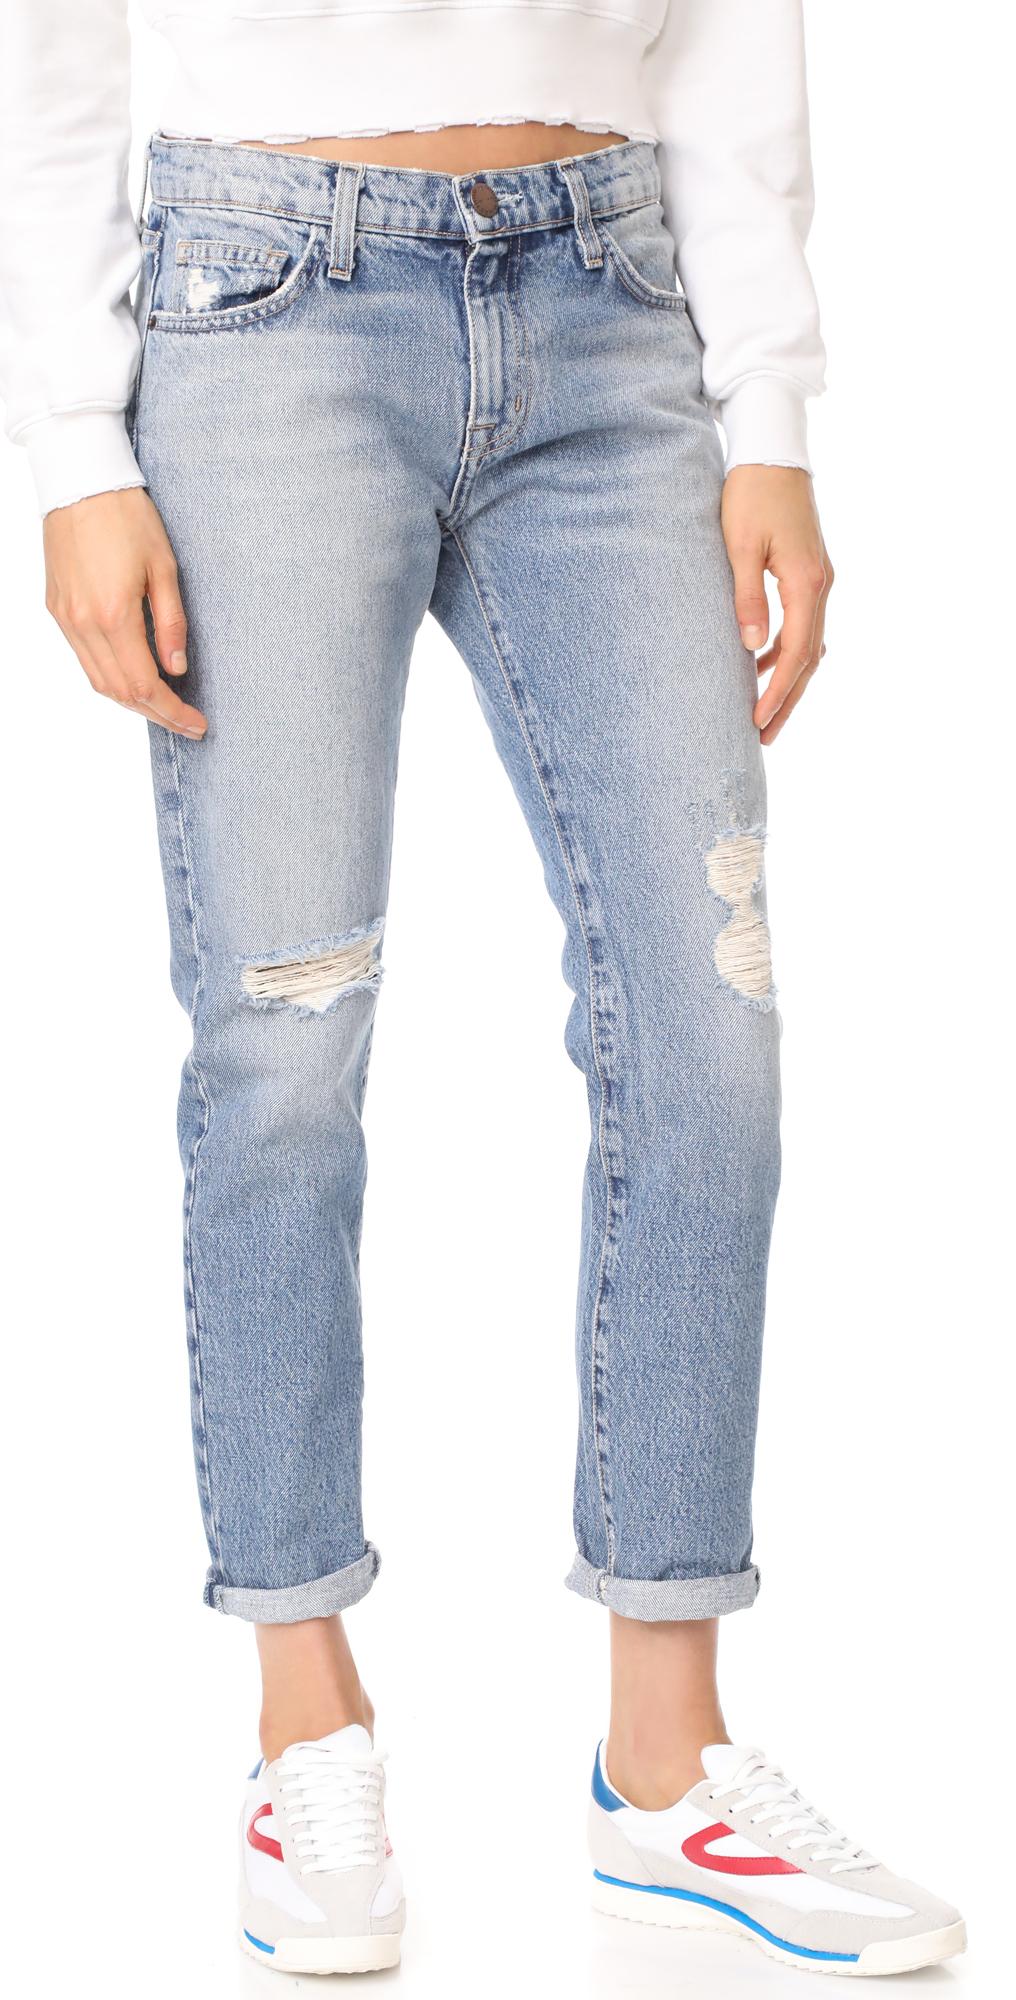 The Fling Jeans Current/Elliott